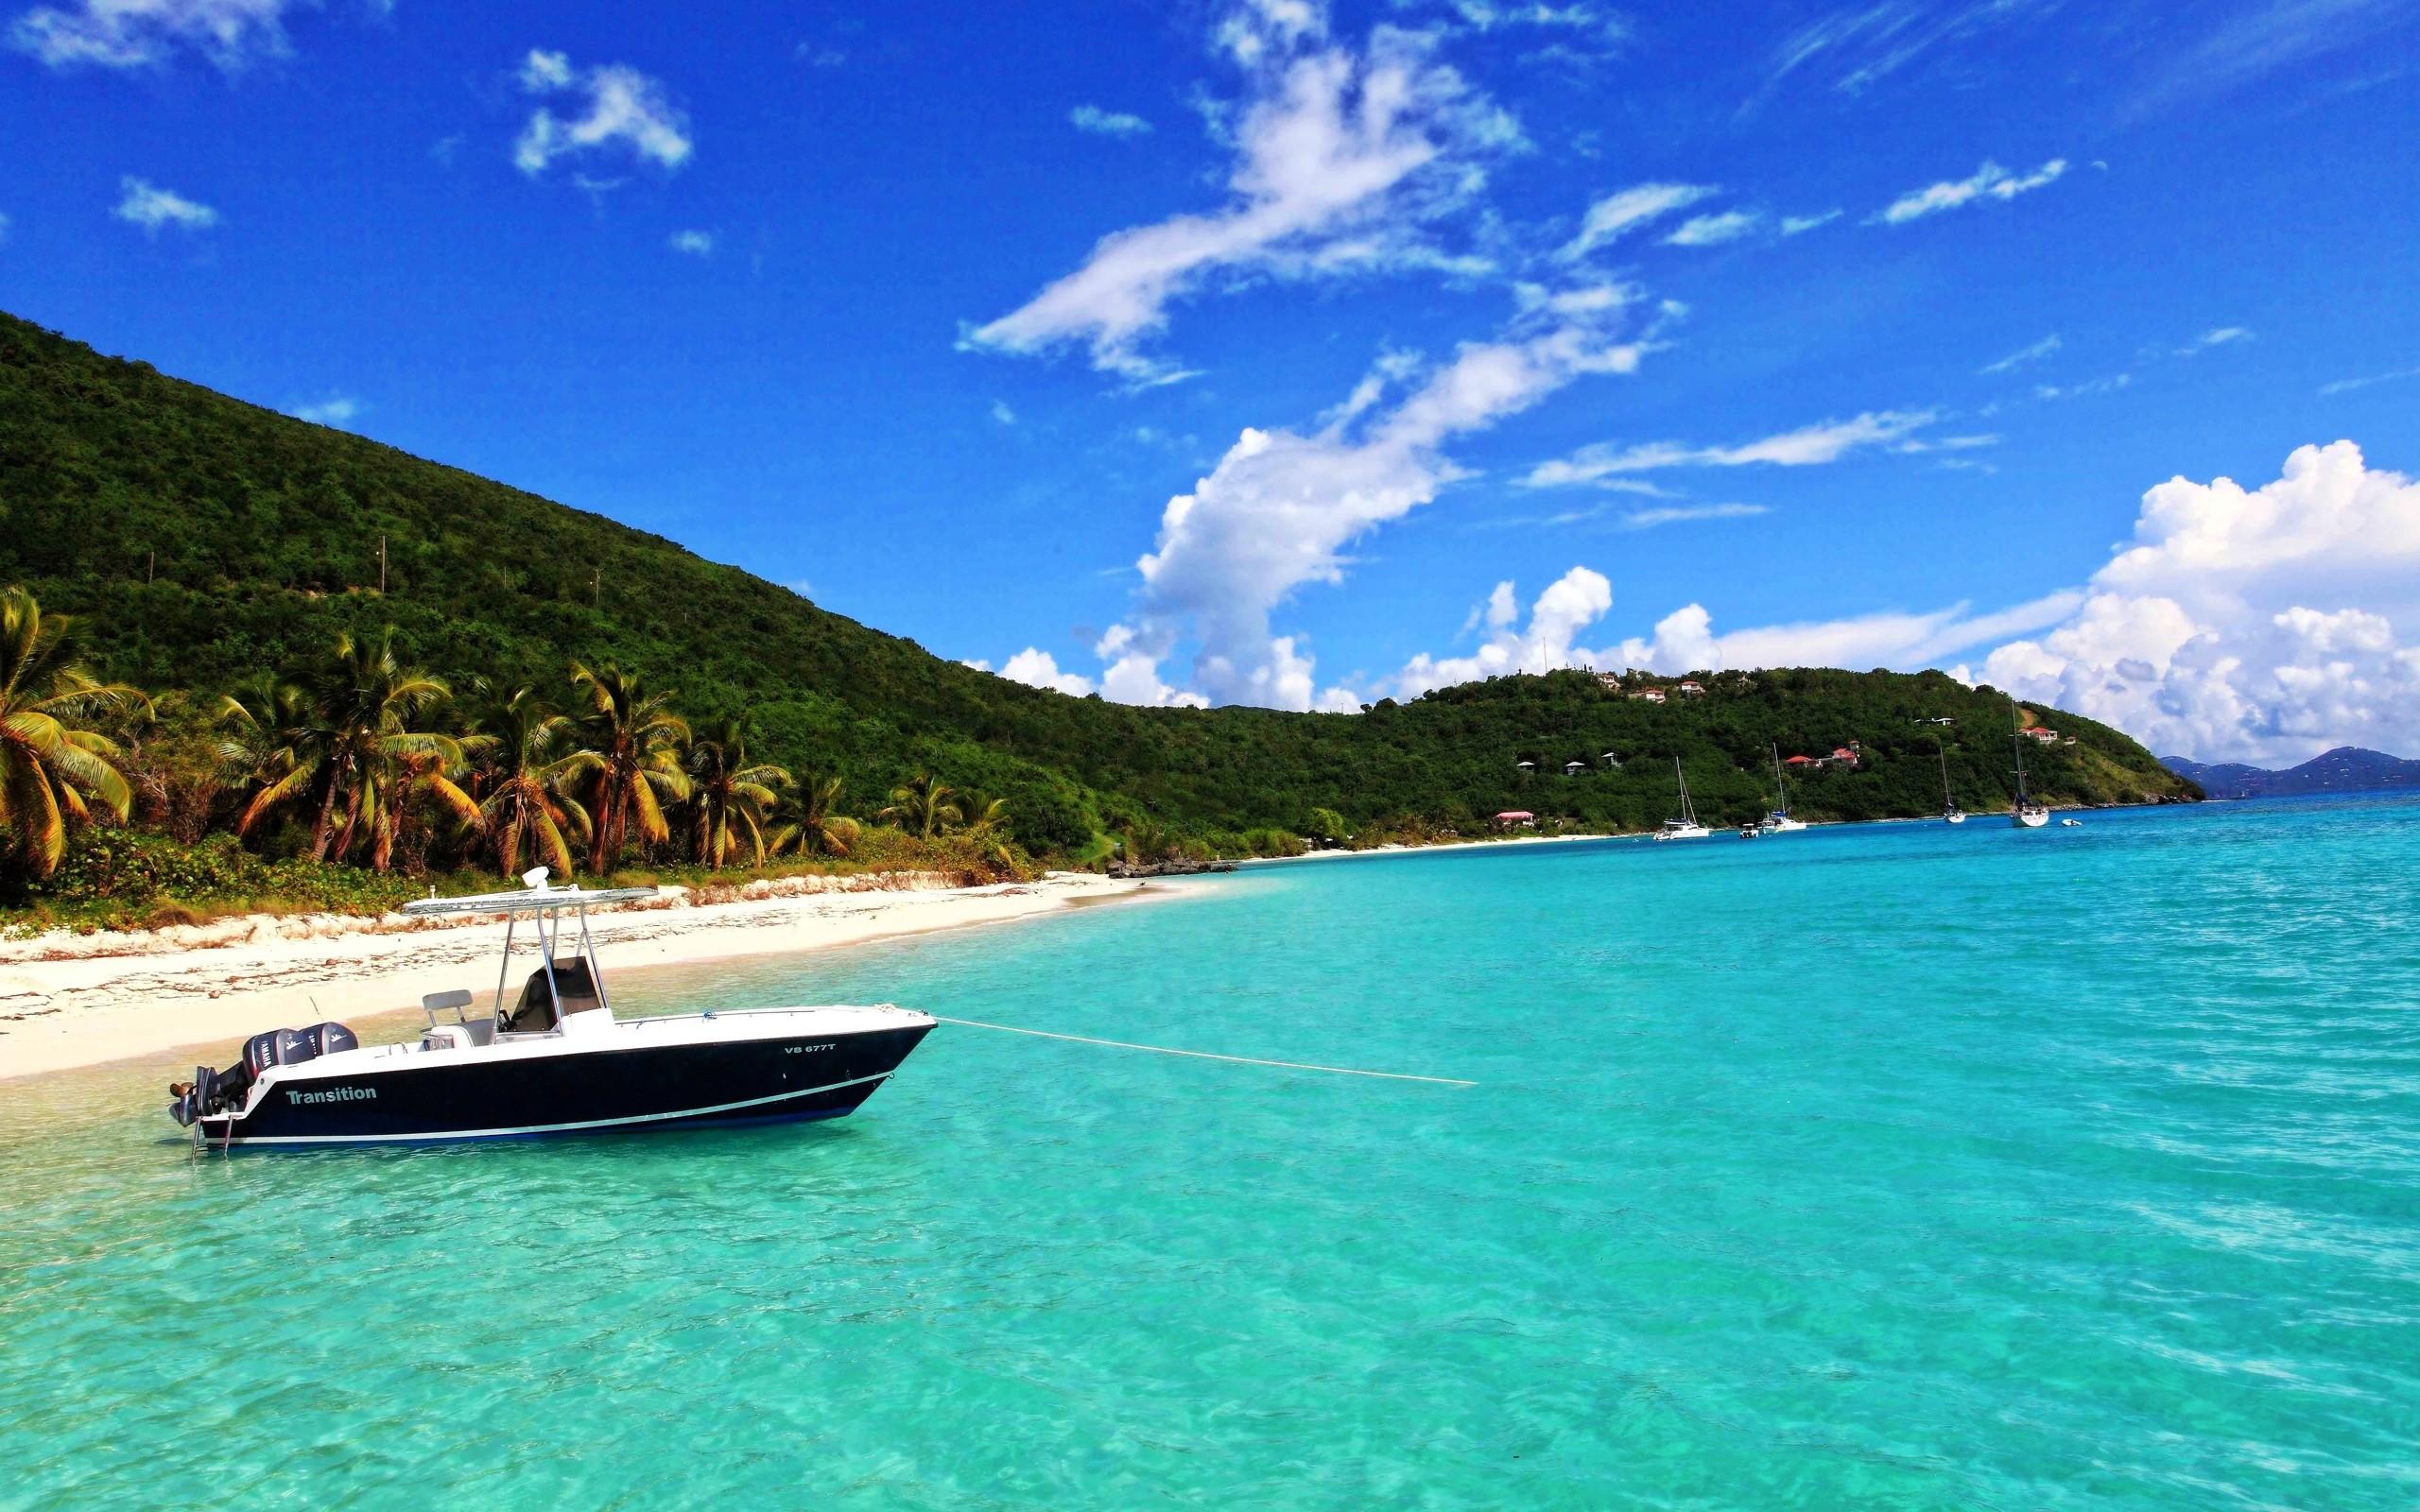 Boat on the Caribbean Island